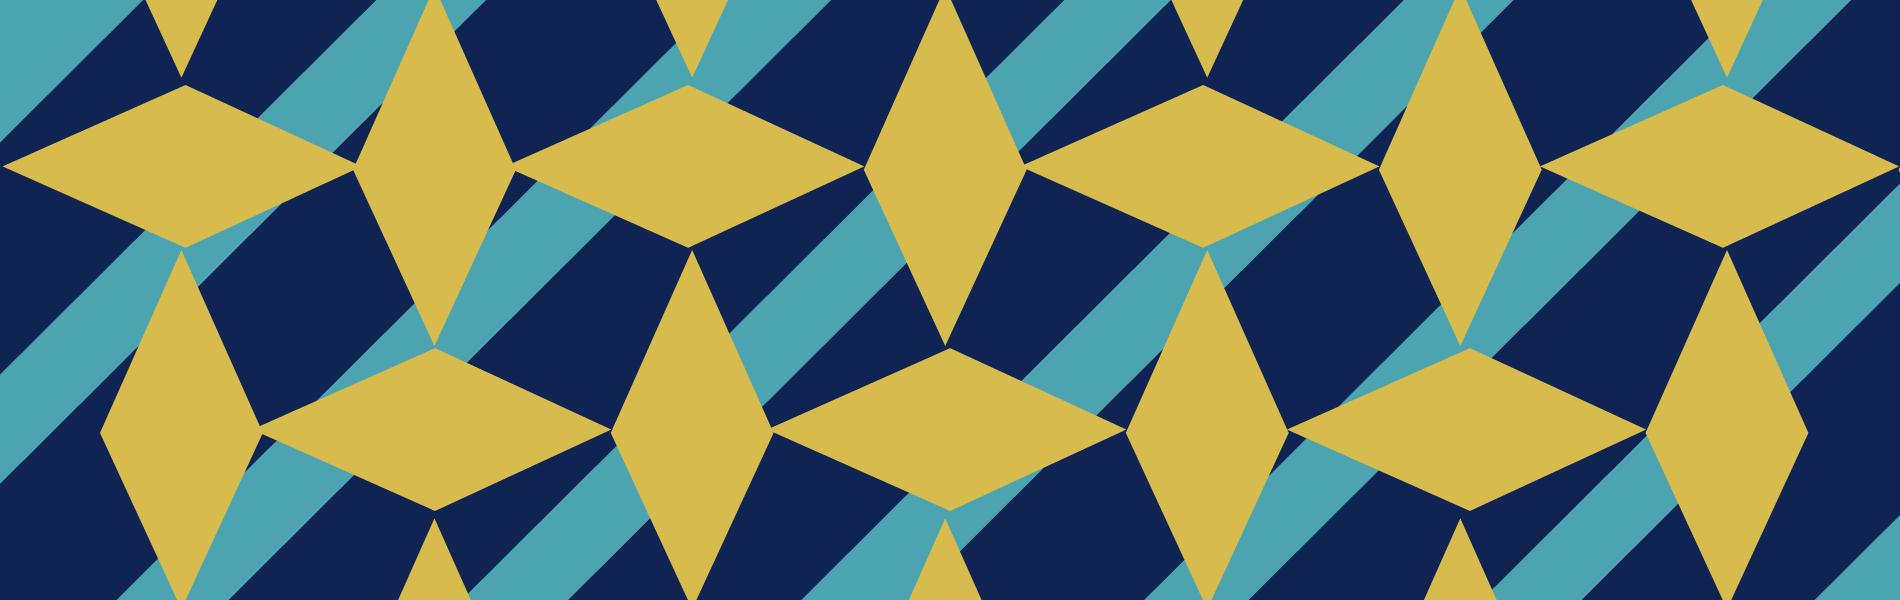 banner-fondo-02